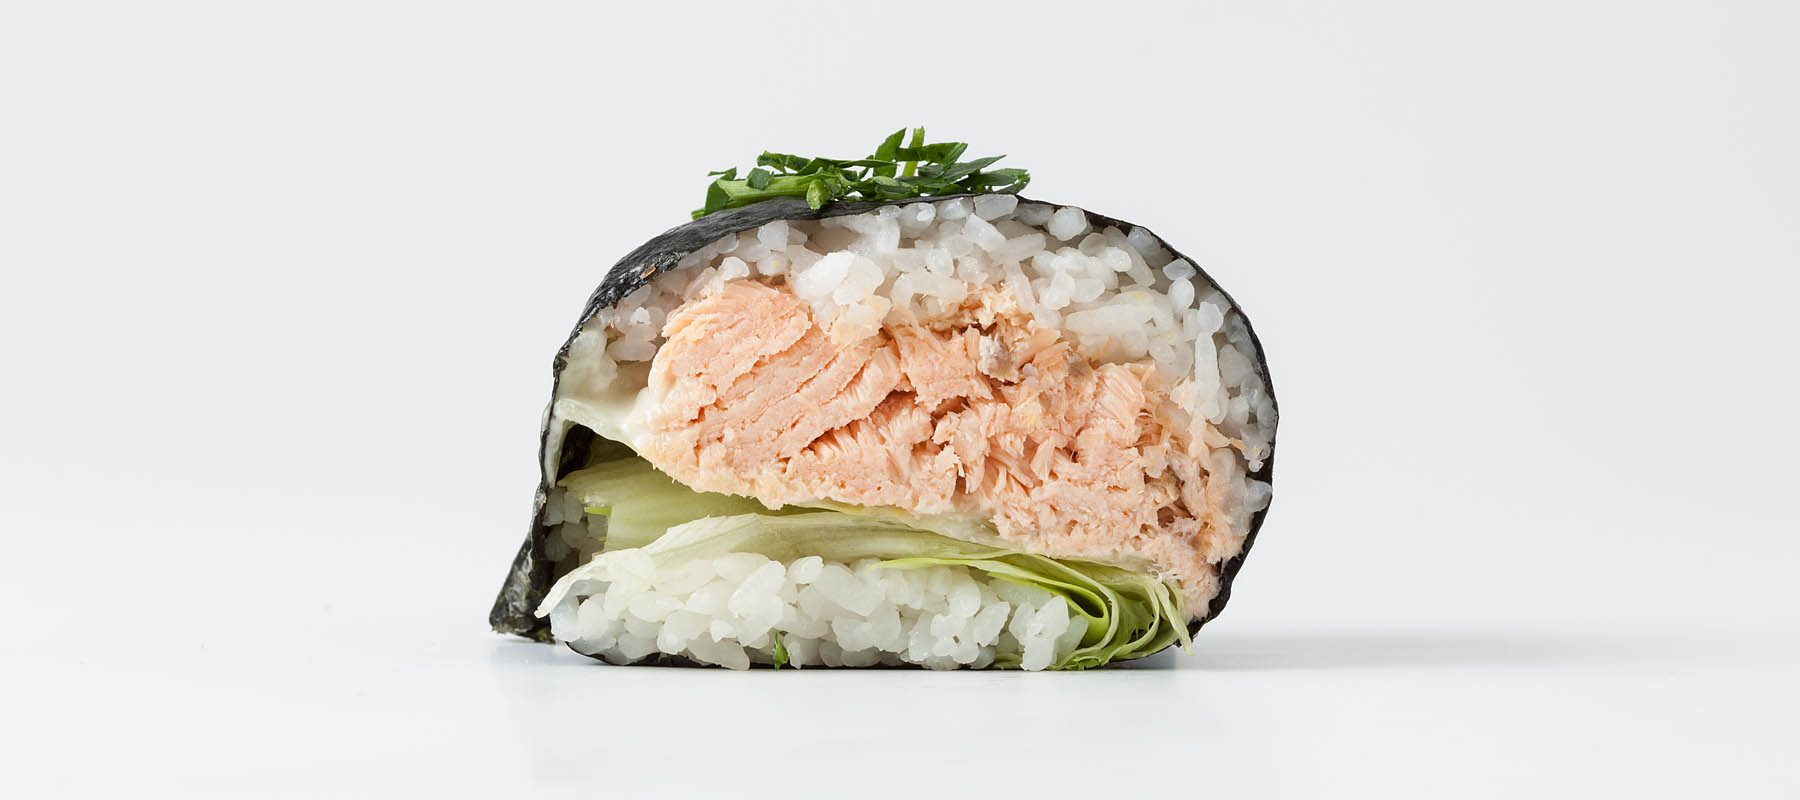 1800x800_Onigirazu_Salmon_kame_japanese_bakery